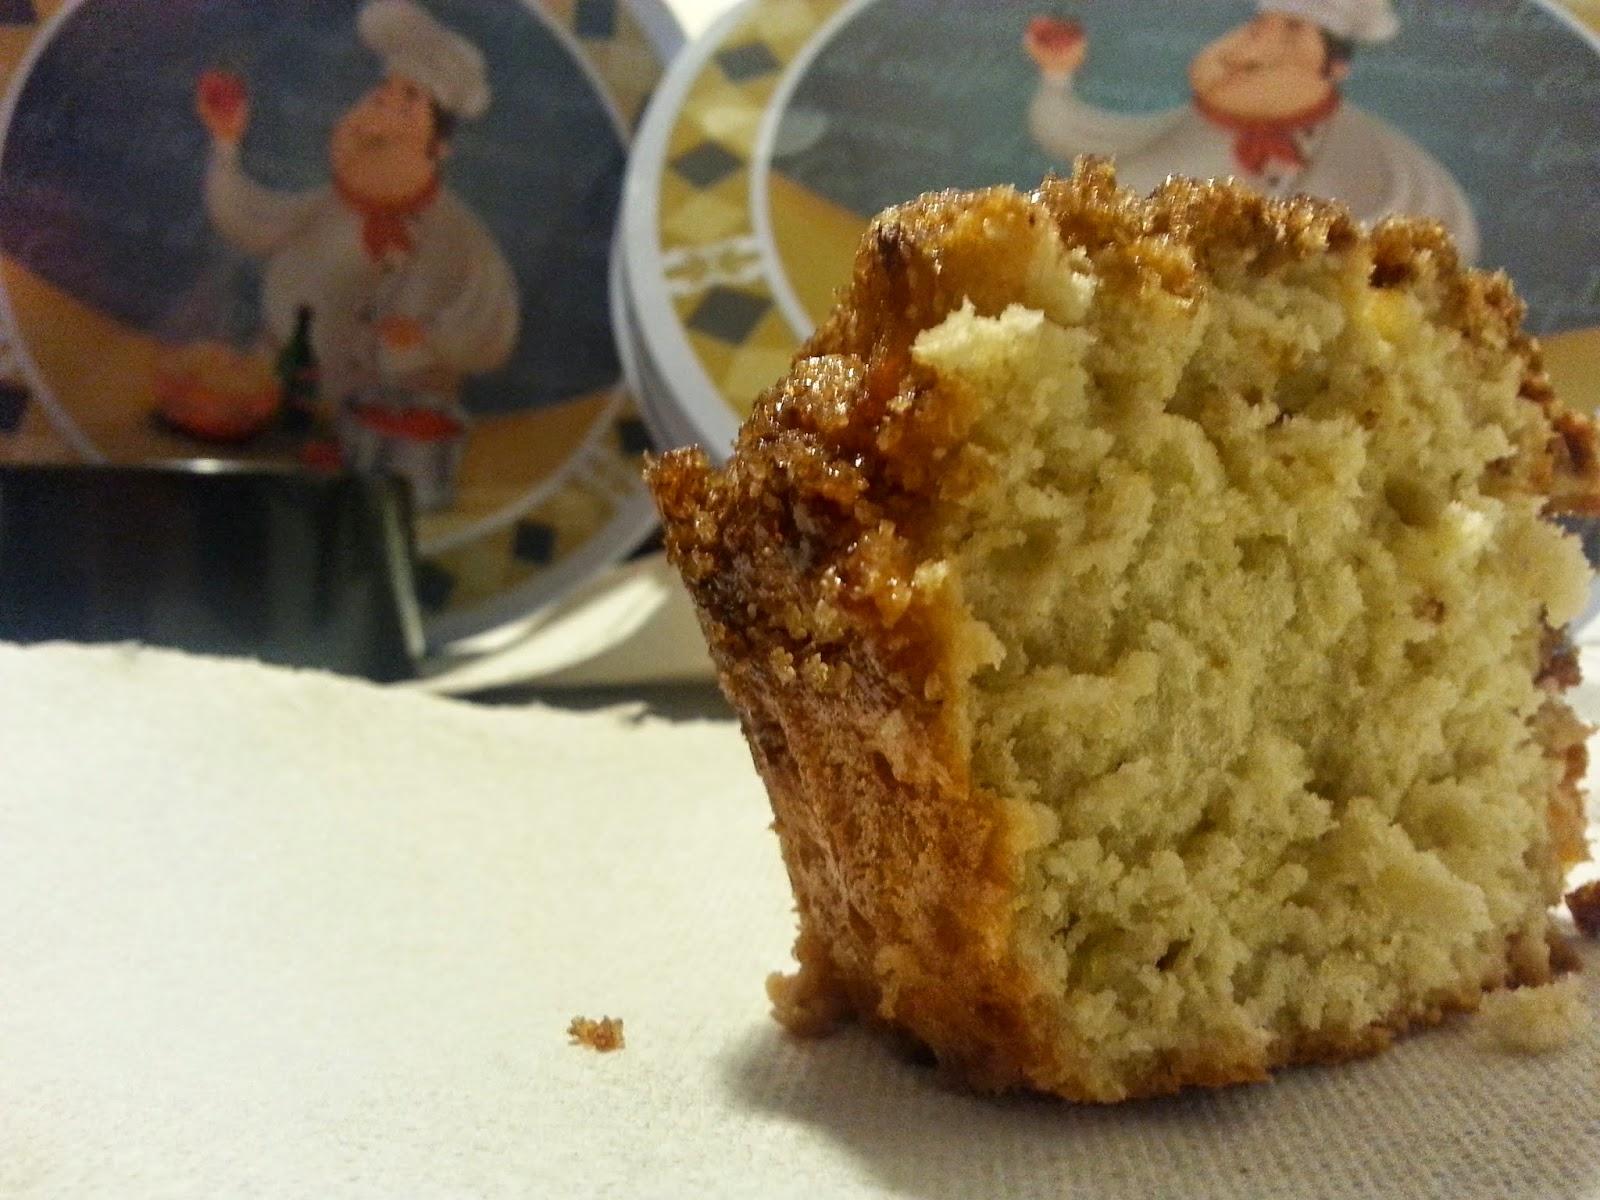 Moravian cake